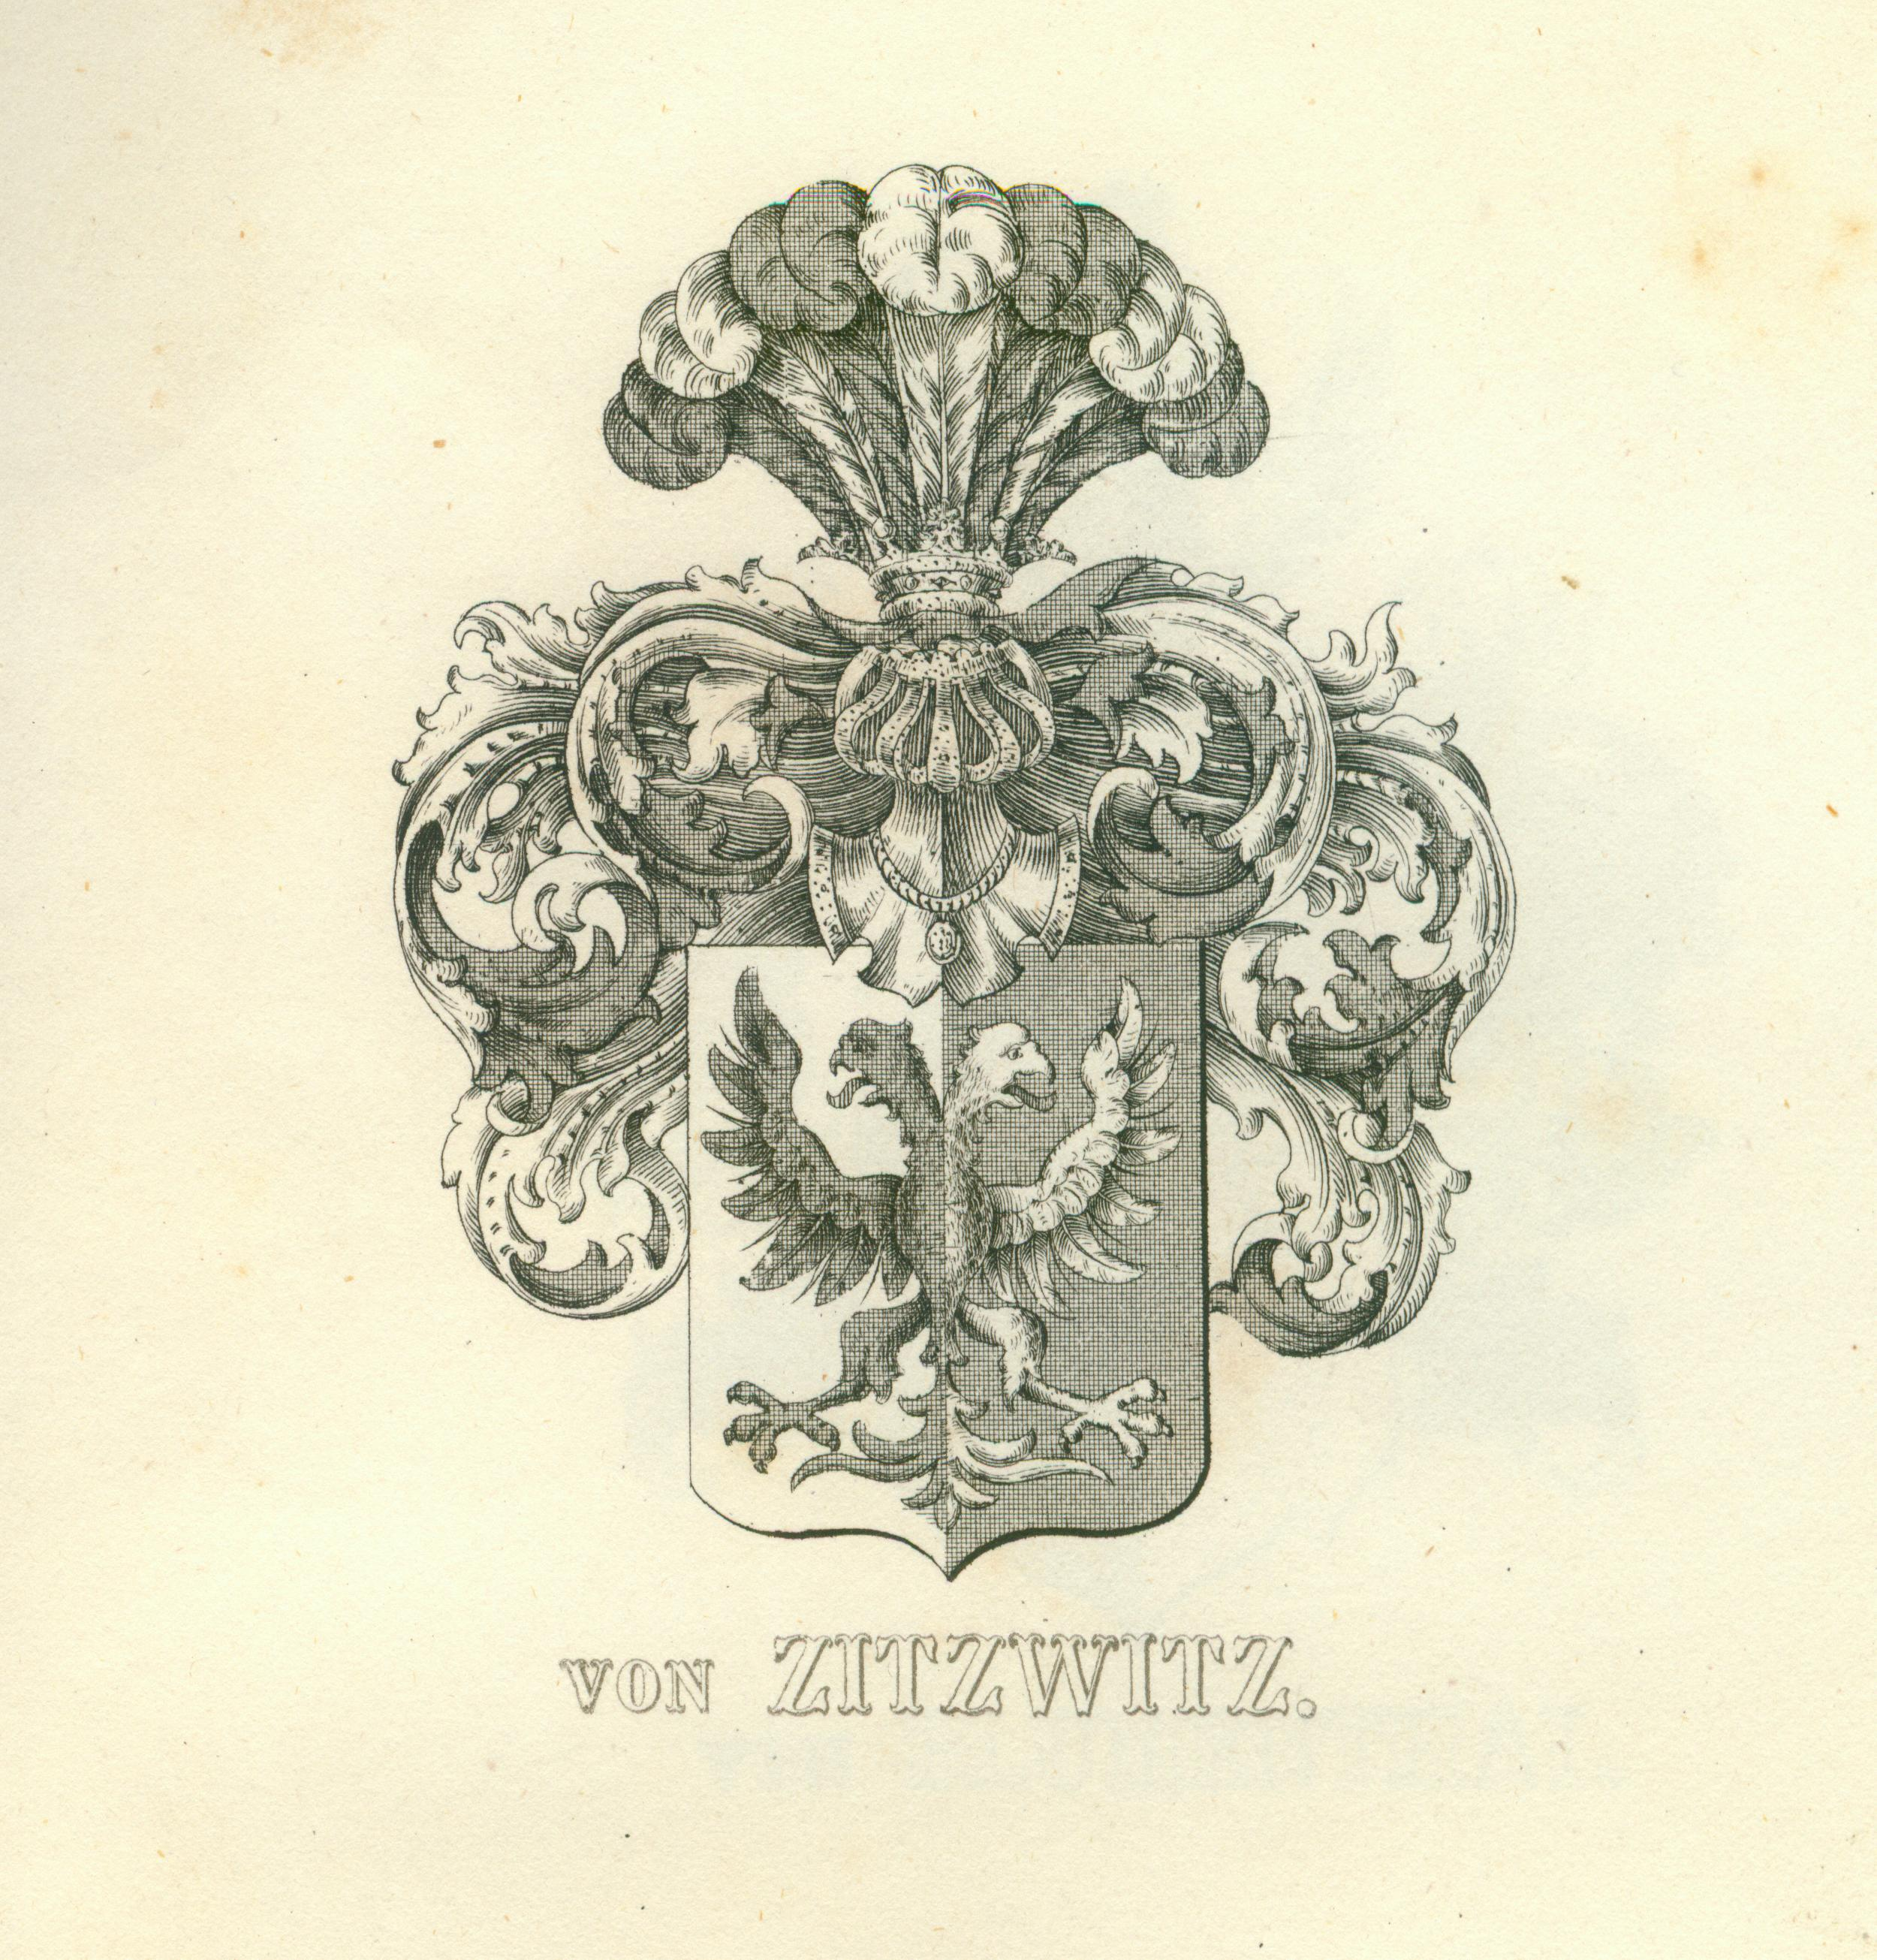 Zitzwitz